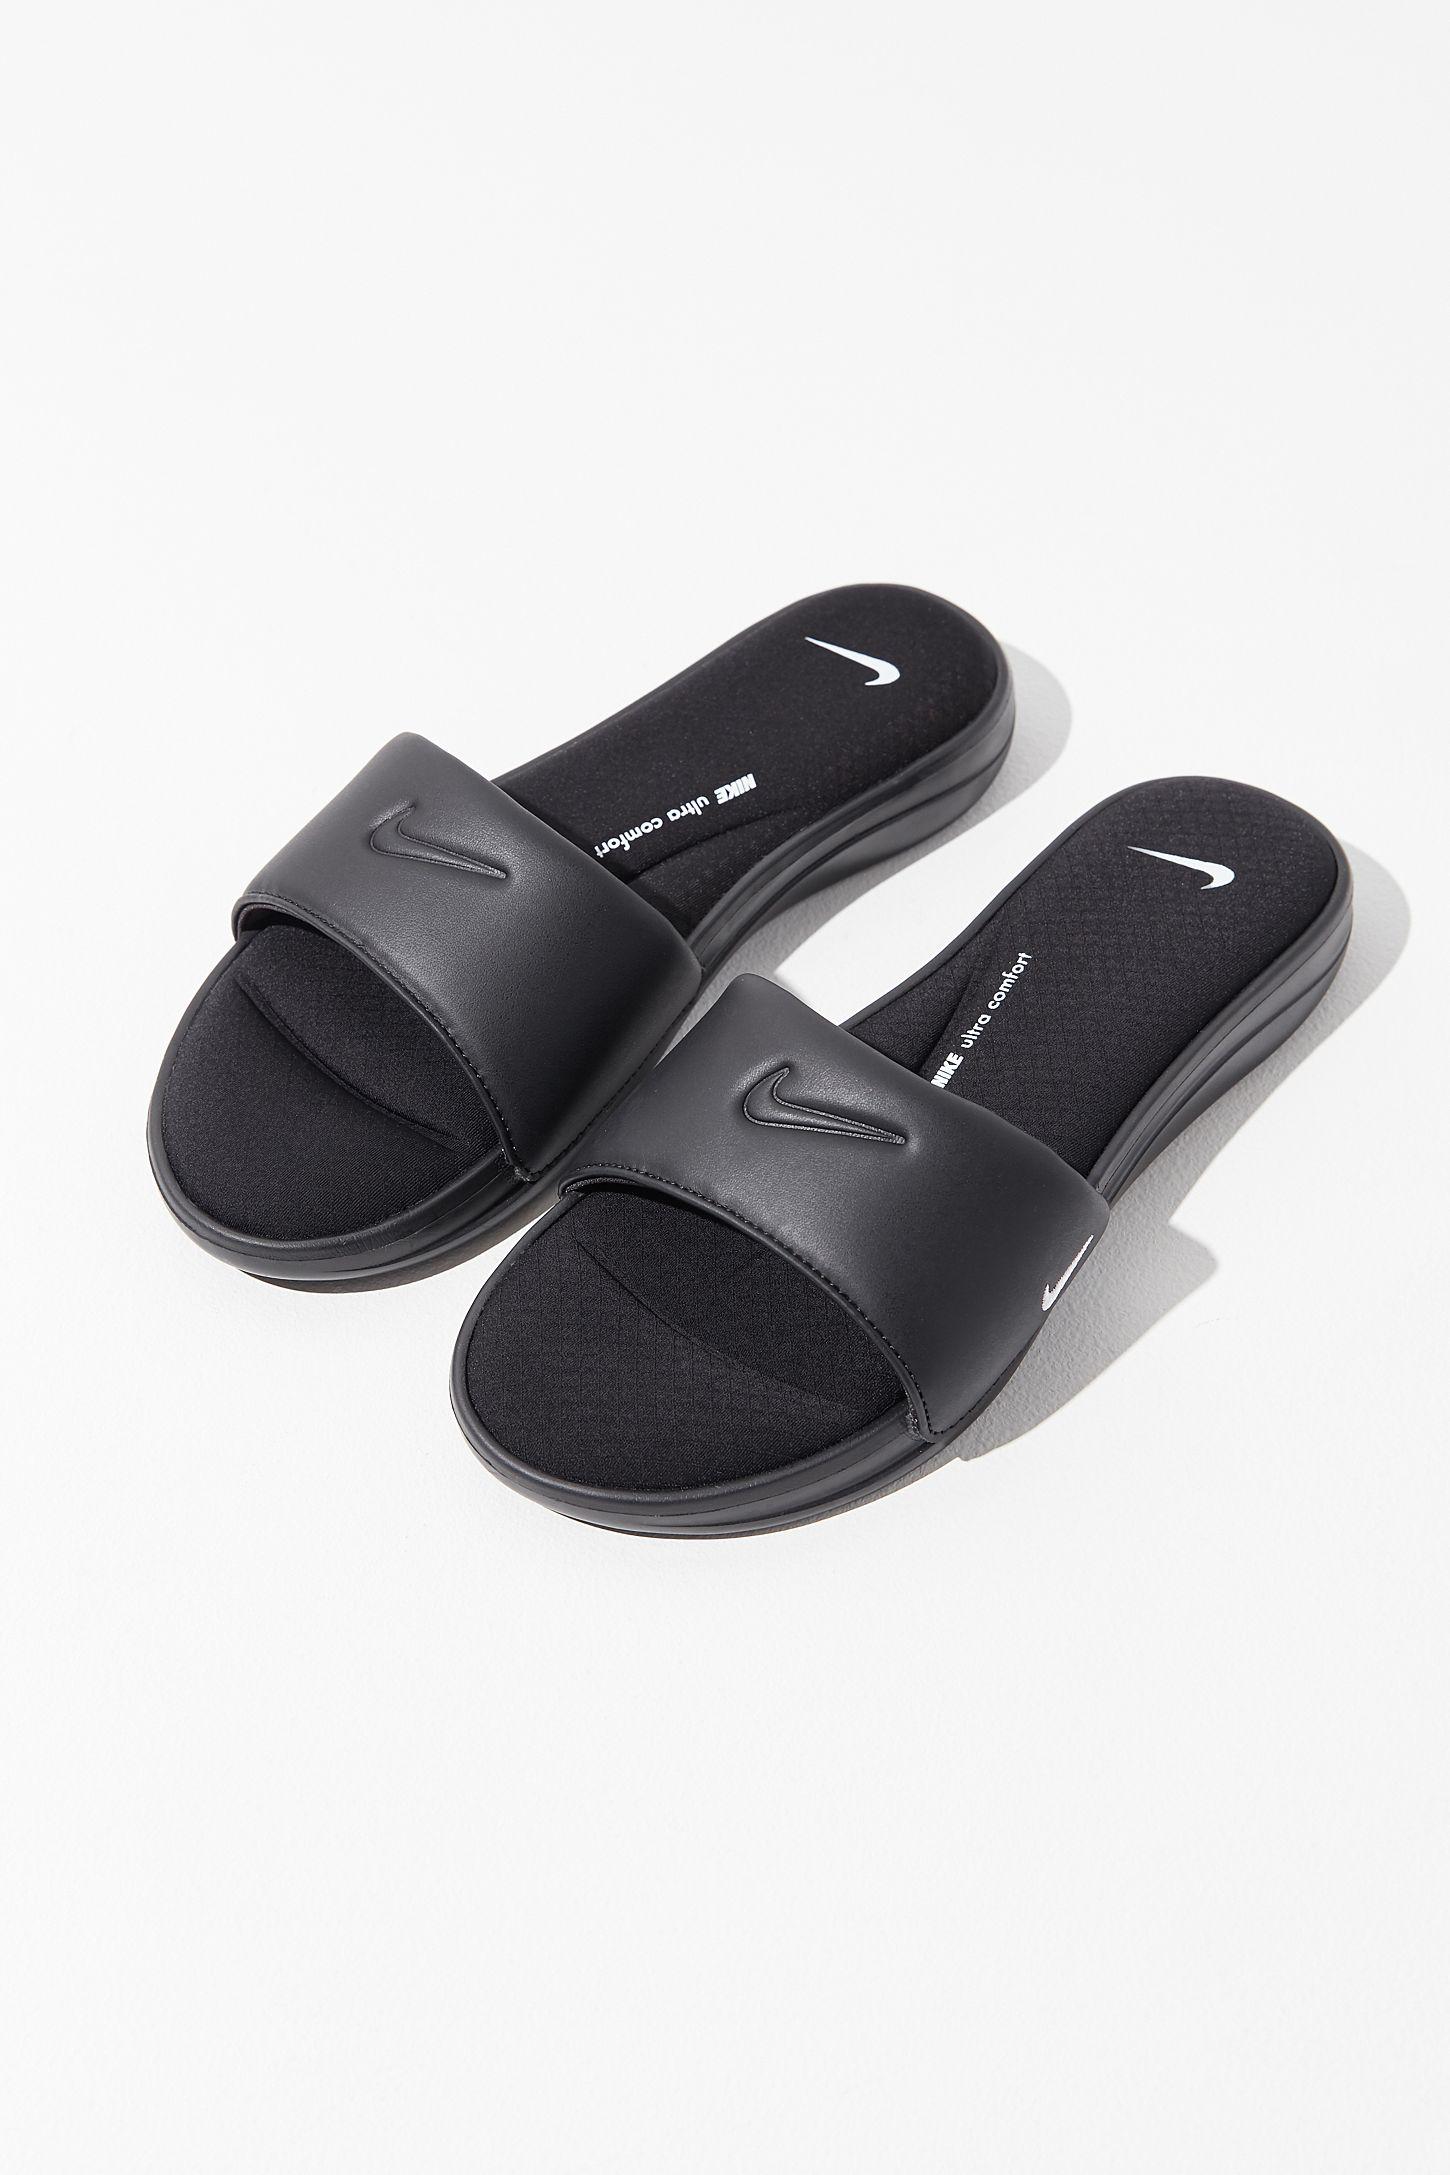 great variety models professional picked up Nike Ultra Comfort 3 Slide Sandal